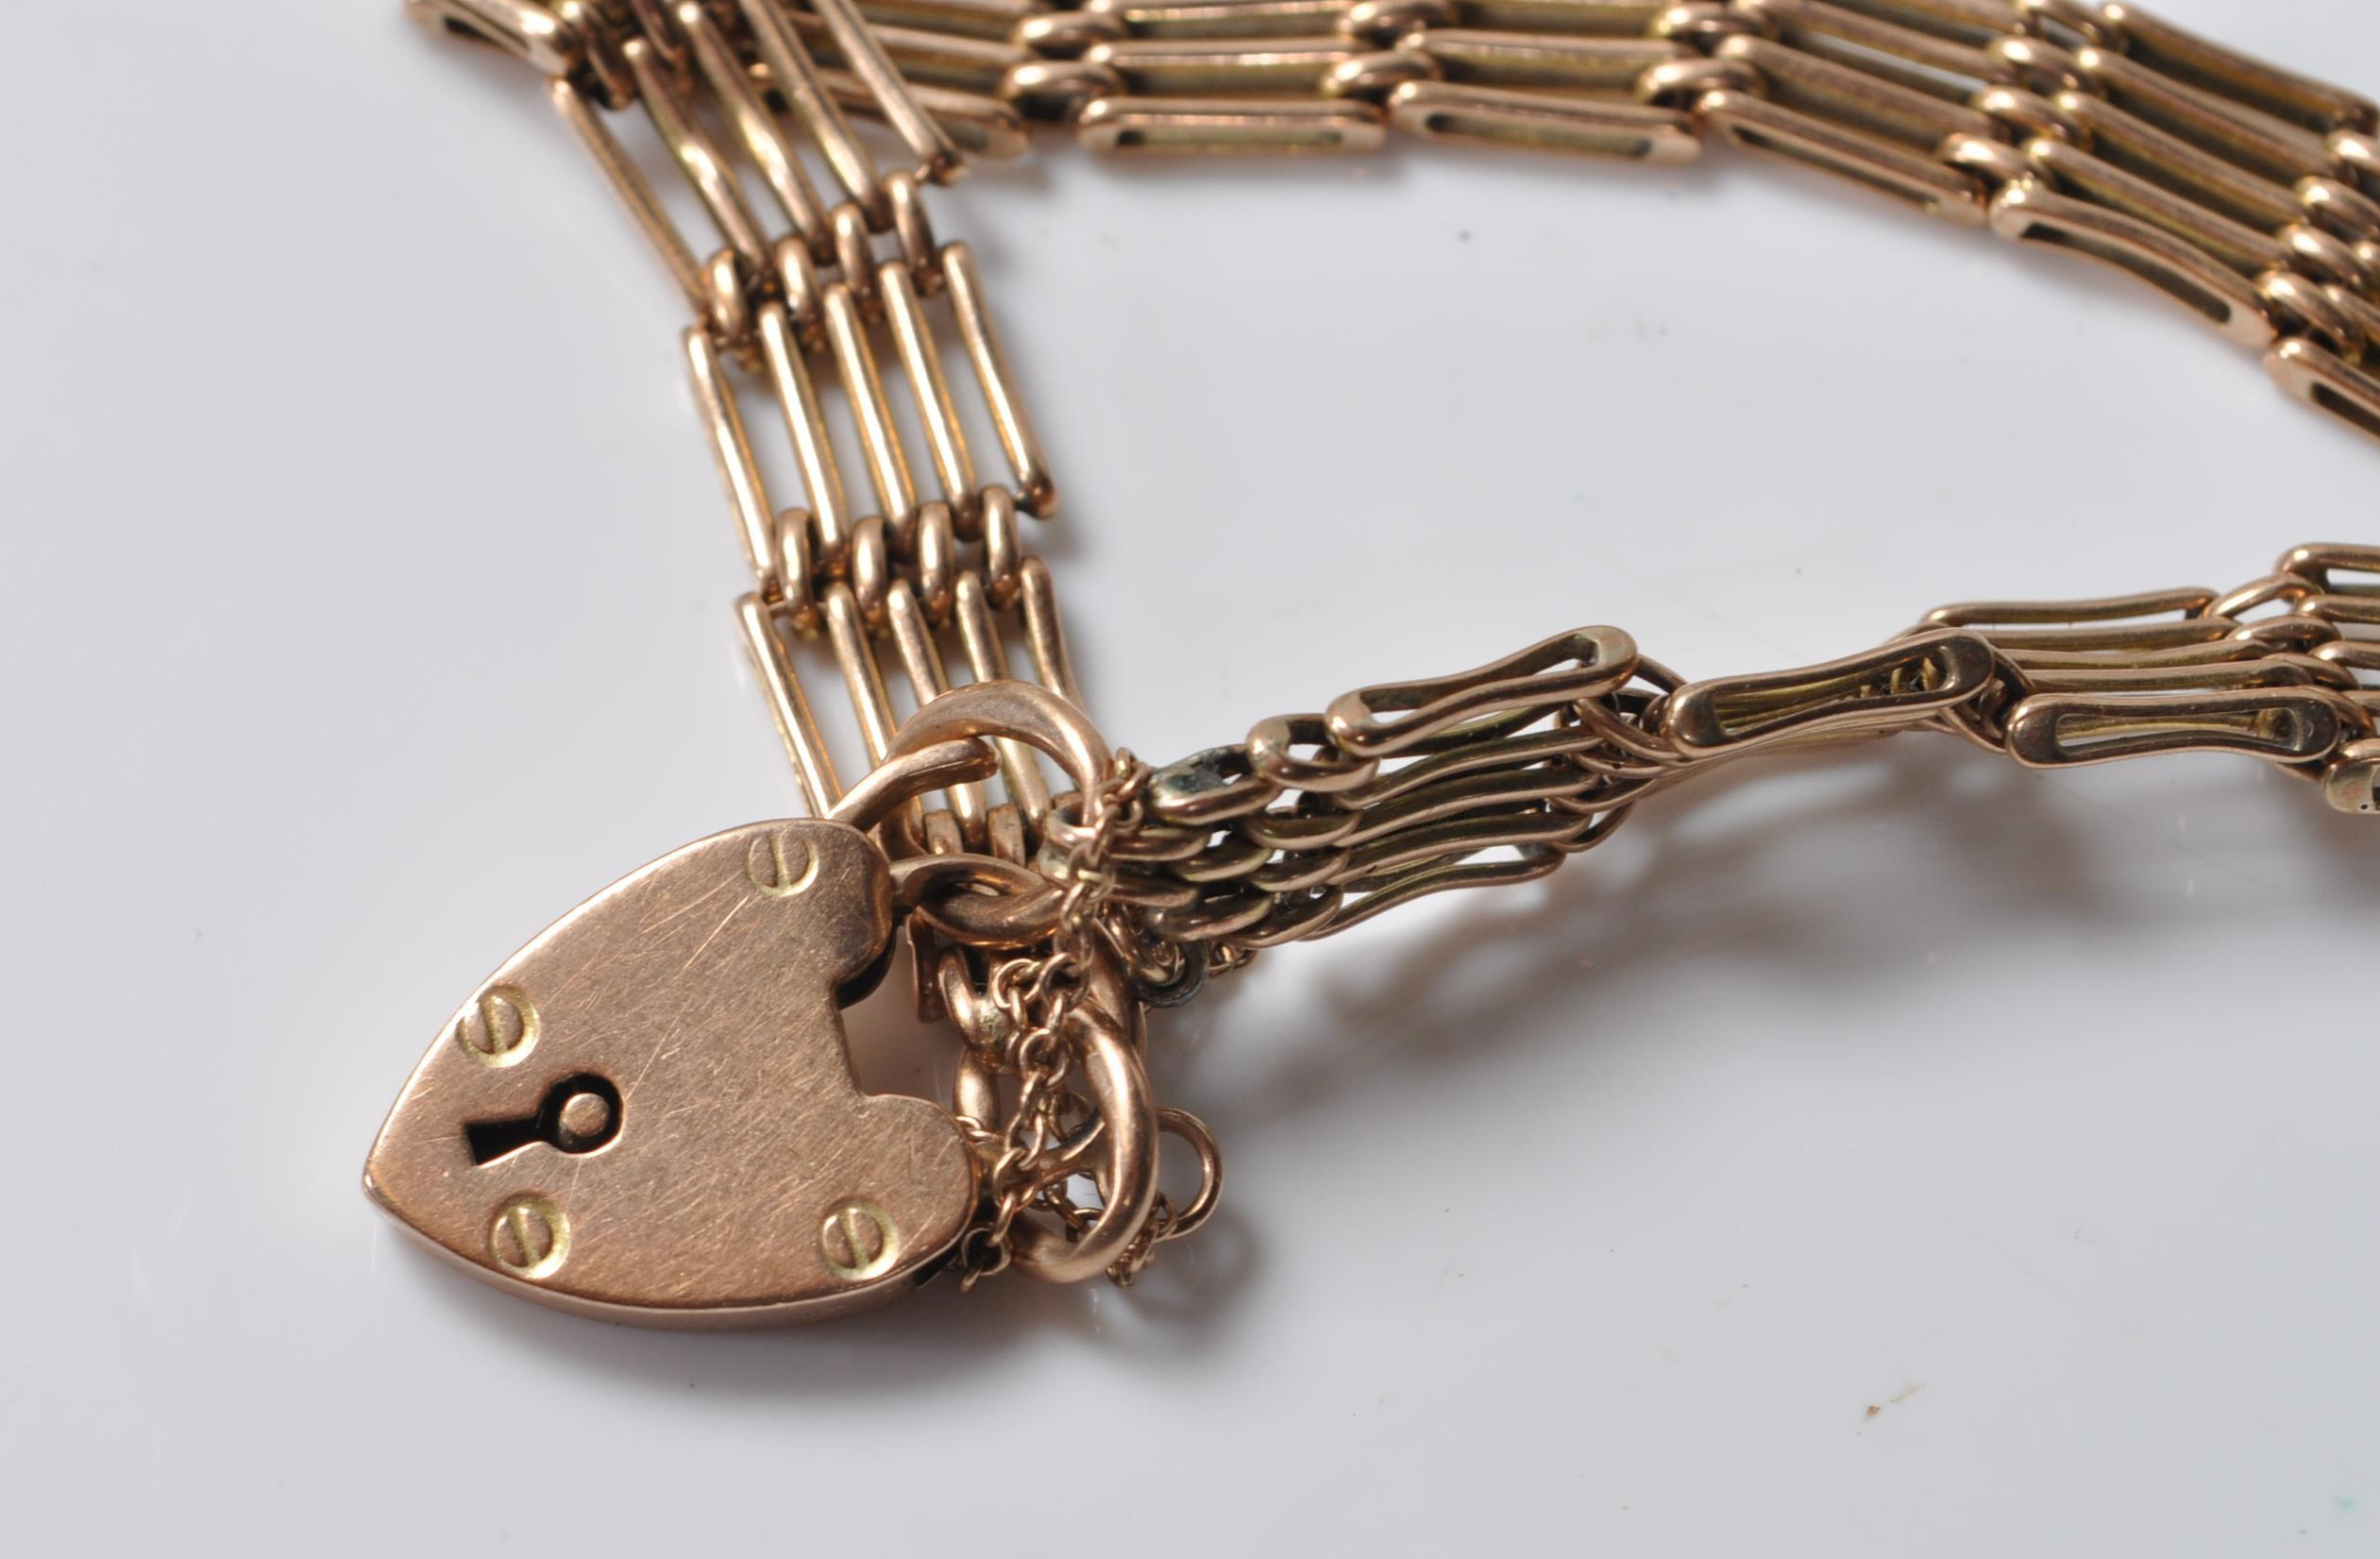 9CT GOLD GATELINK BRACELET - Image 5 of 5